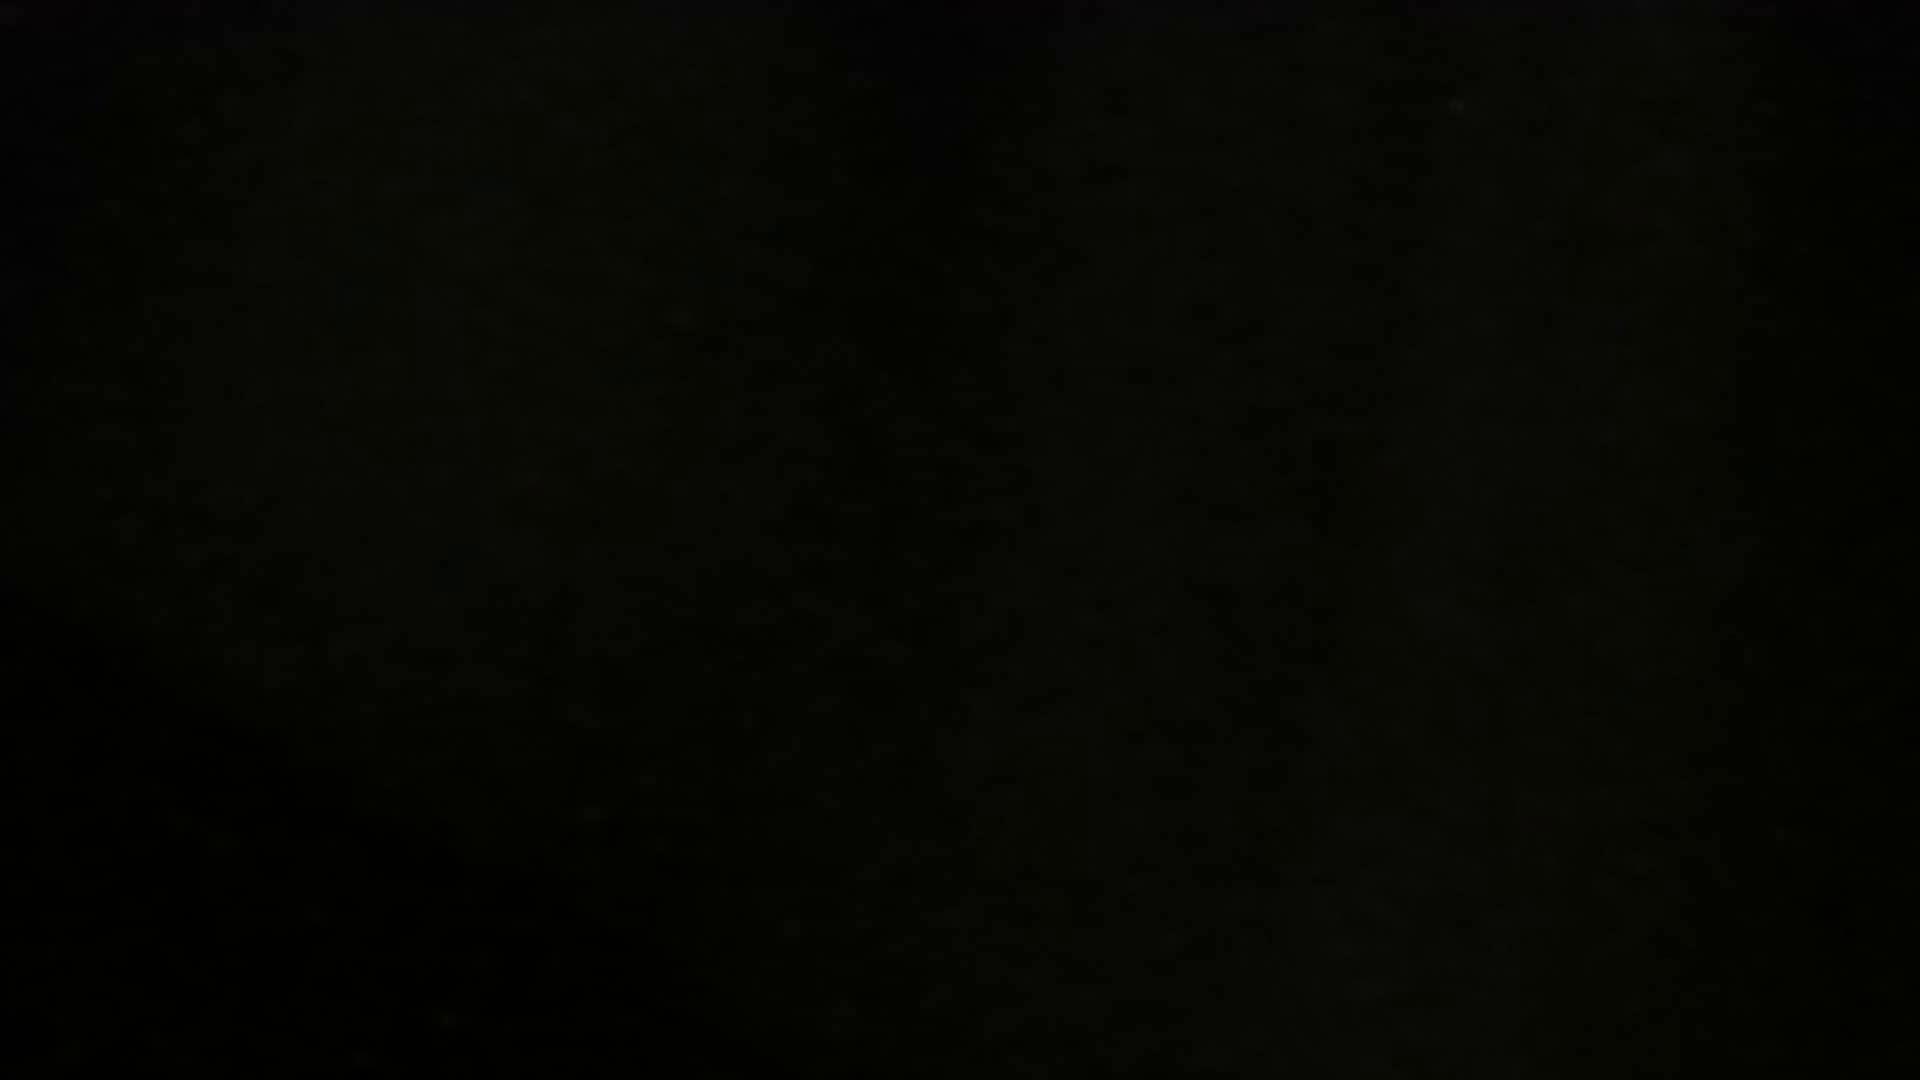 SPYさん初投稿!マンション覗き!5000K!ハイビジョン撮影VOL.05(元サッカー部員社会人) スポーツマン  38pic 21